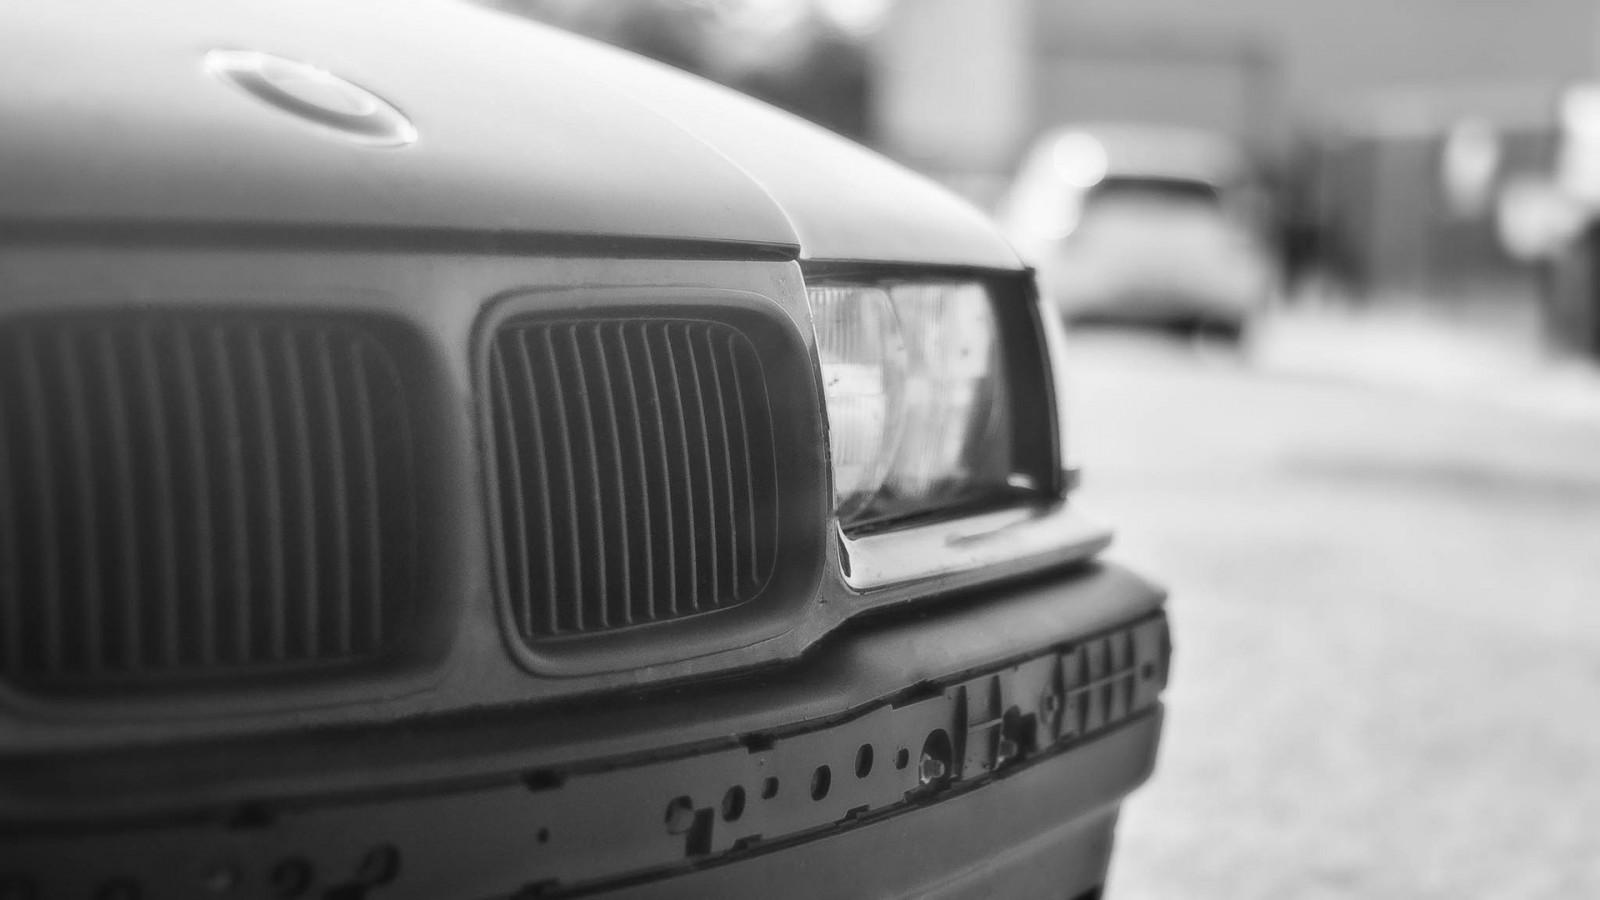 Wallpaper : 1920x1080 px, BMW E36, car, drift, German cars ...